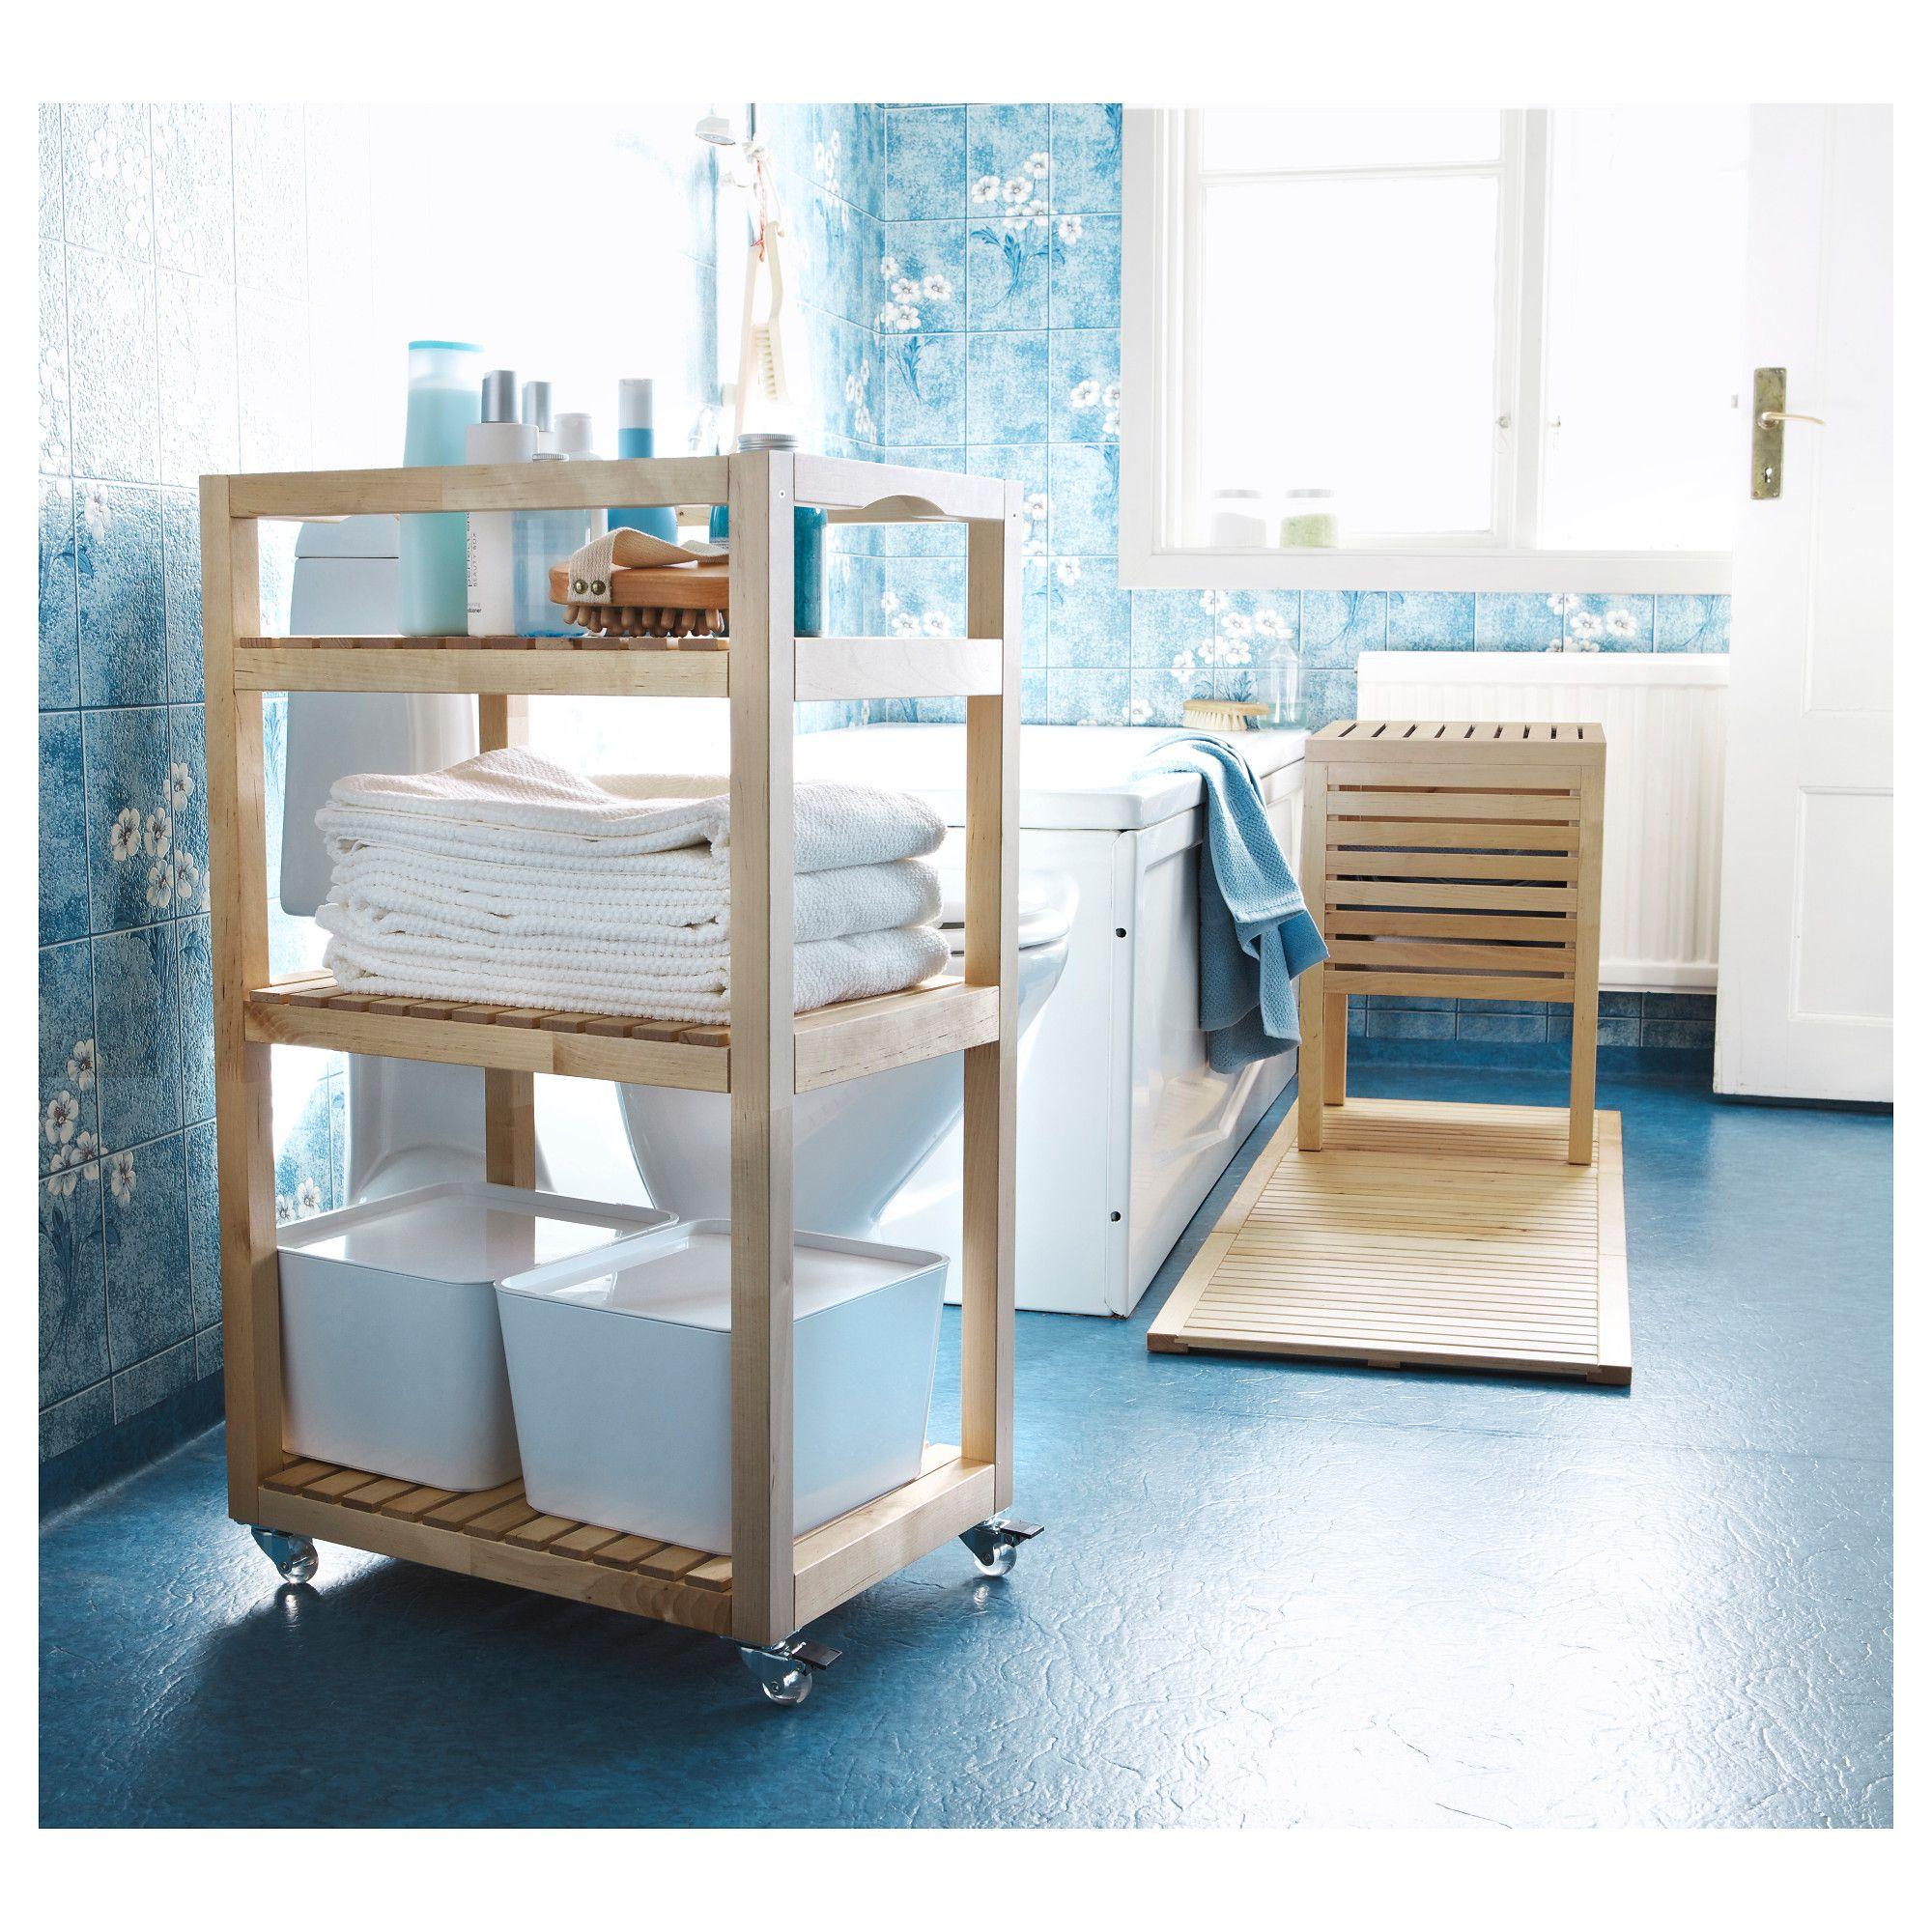 Ikea Molger Cart Birch Lavar Muebles Auxiliares Bano Bano